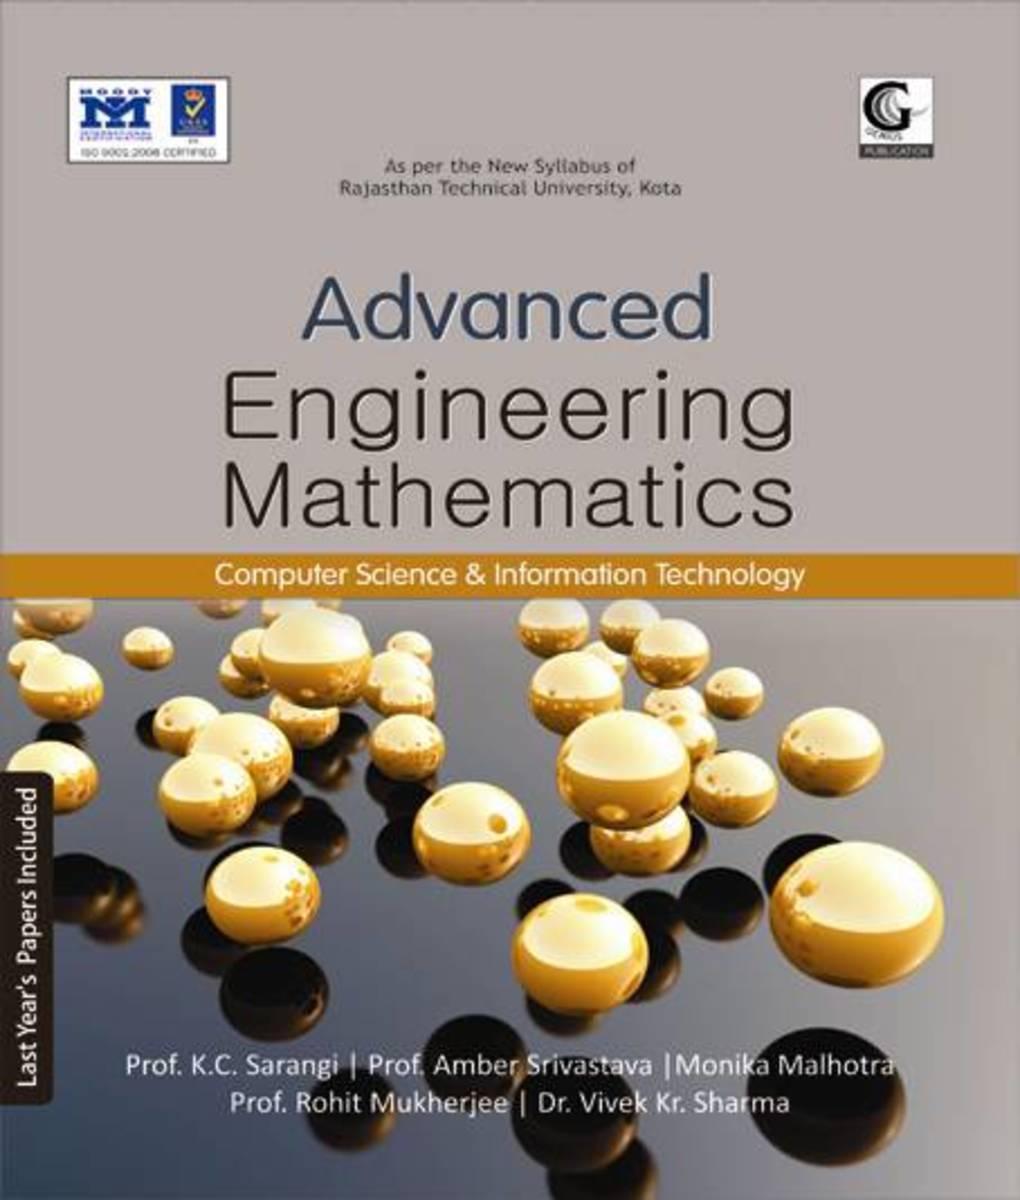 Engineering Mathematics-III Book for CS/IT Branch